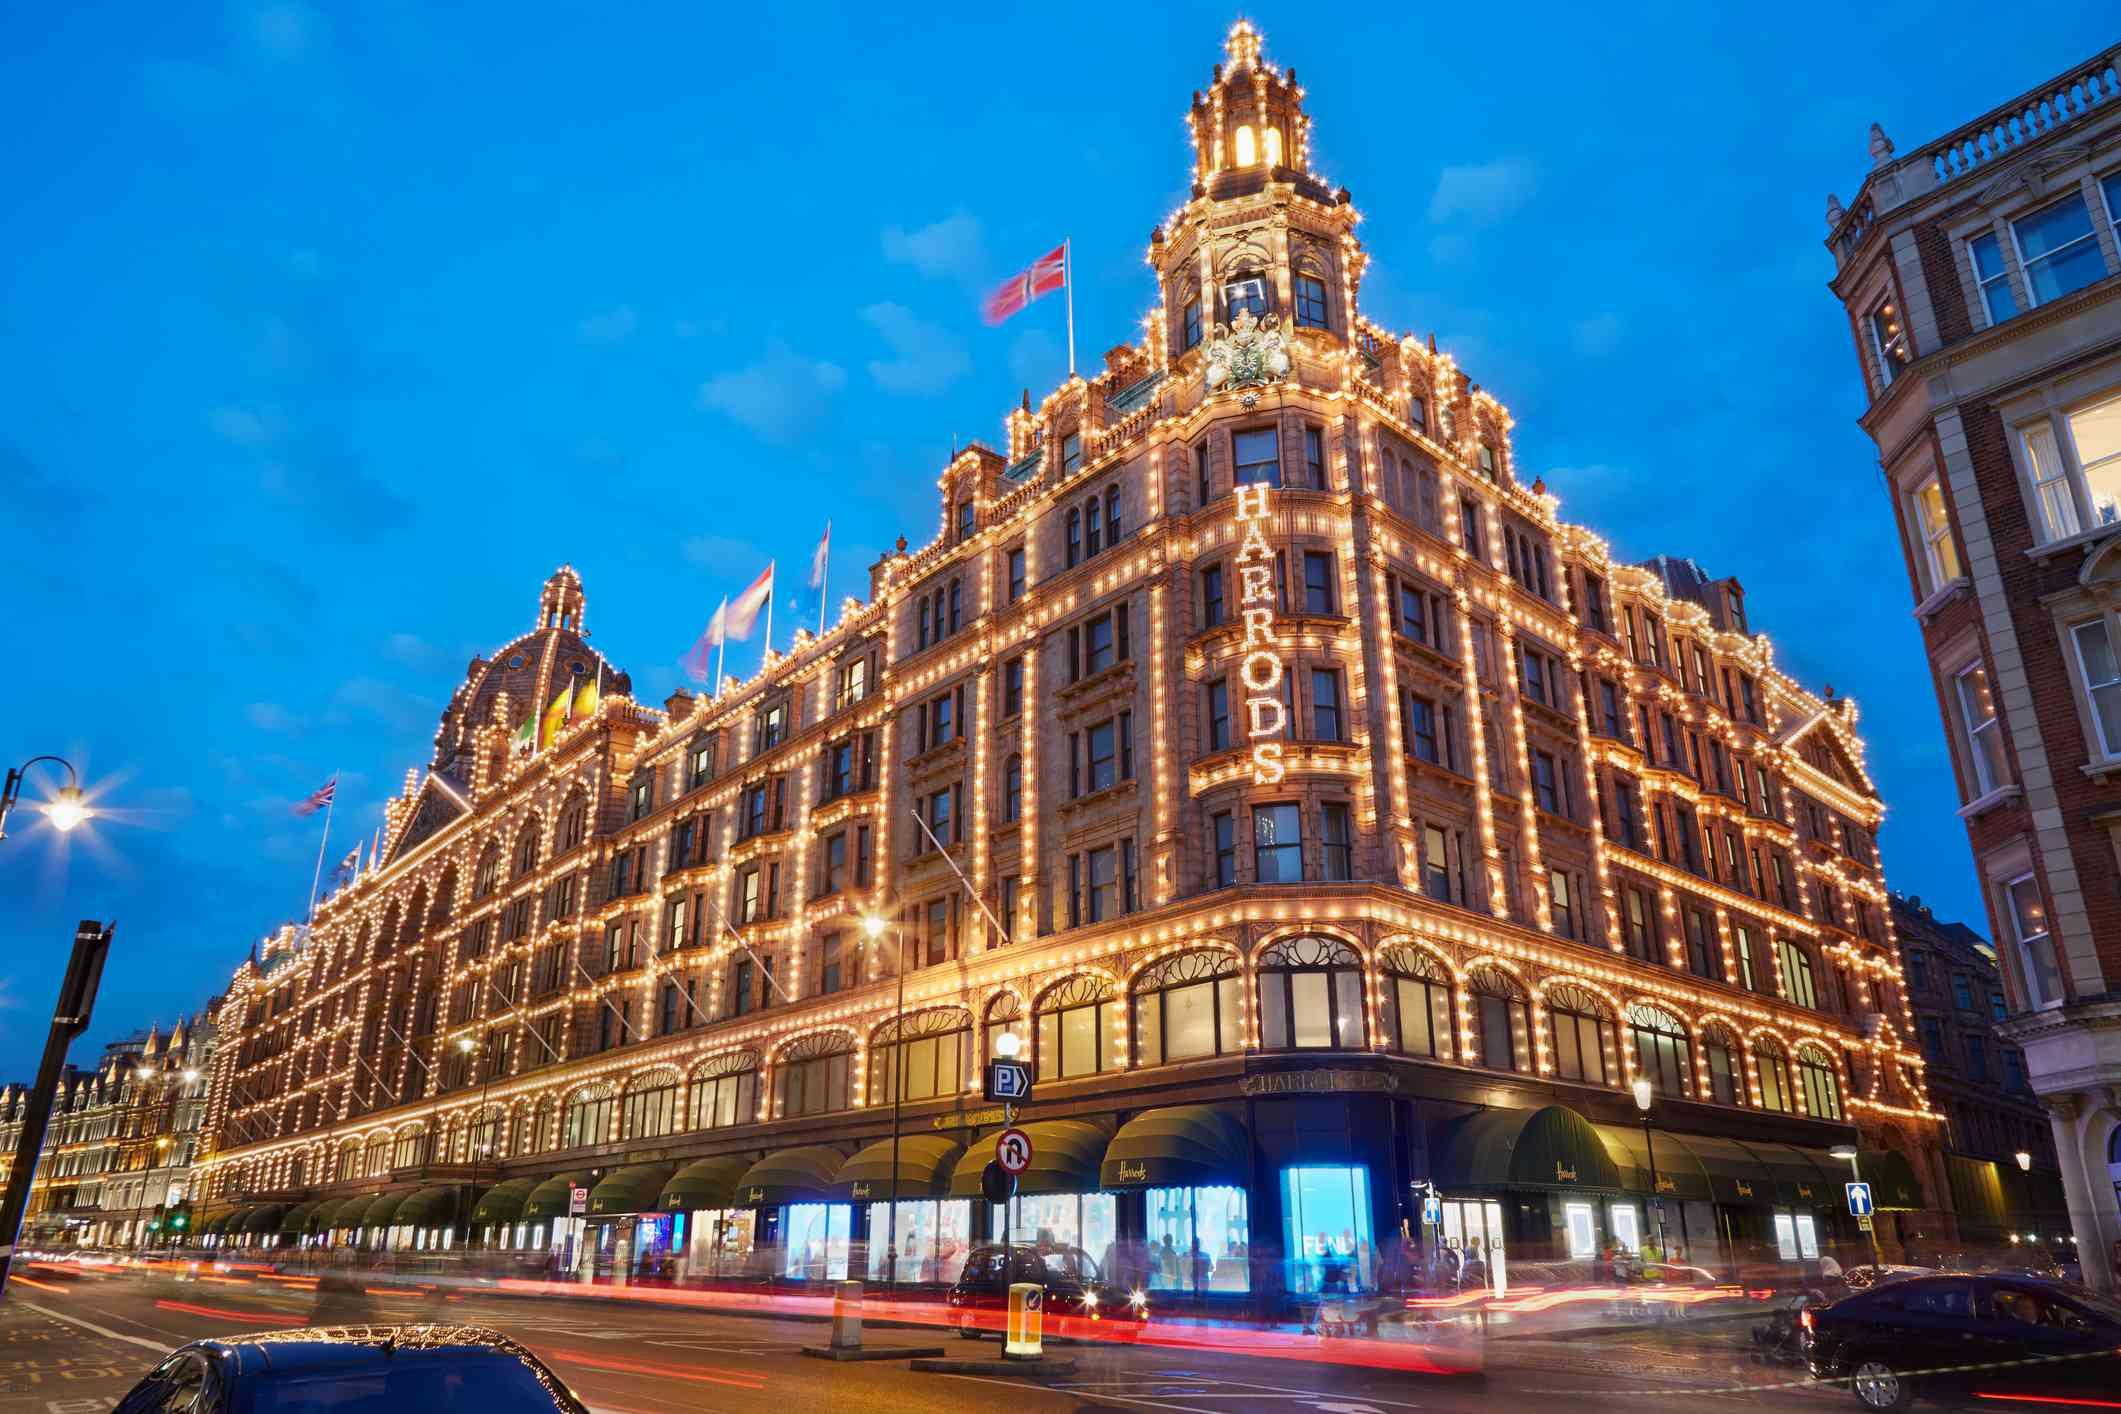 Harrods department store illuminated in the evening